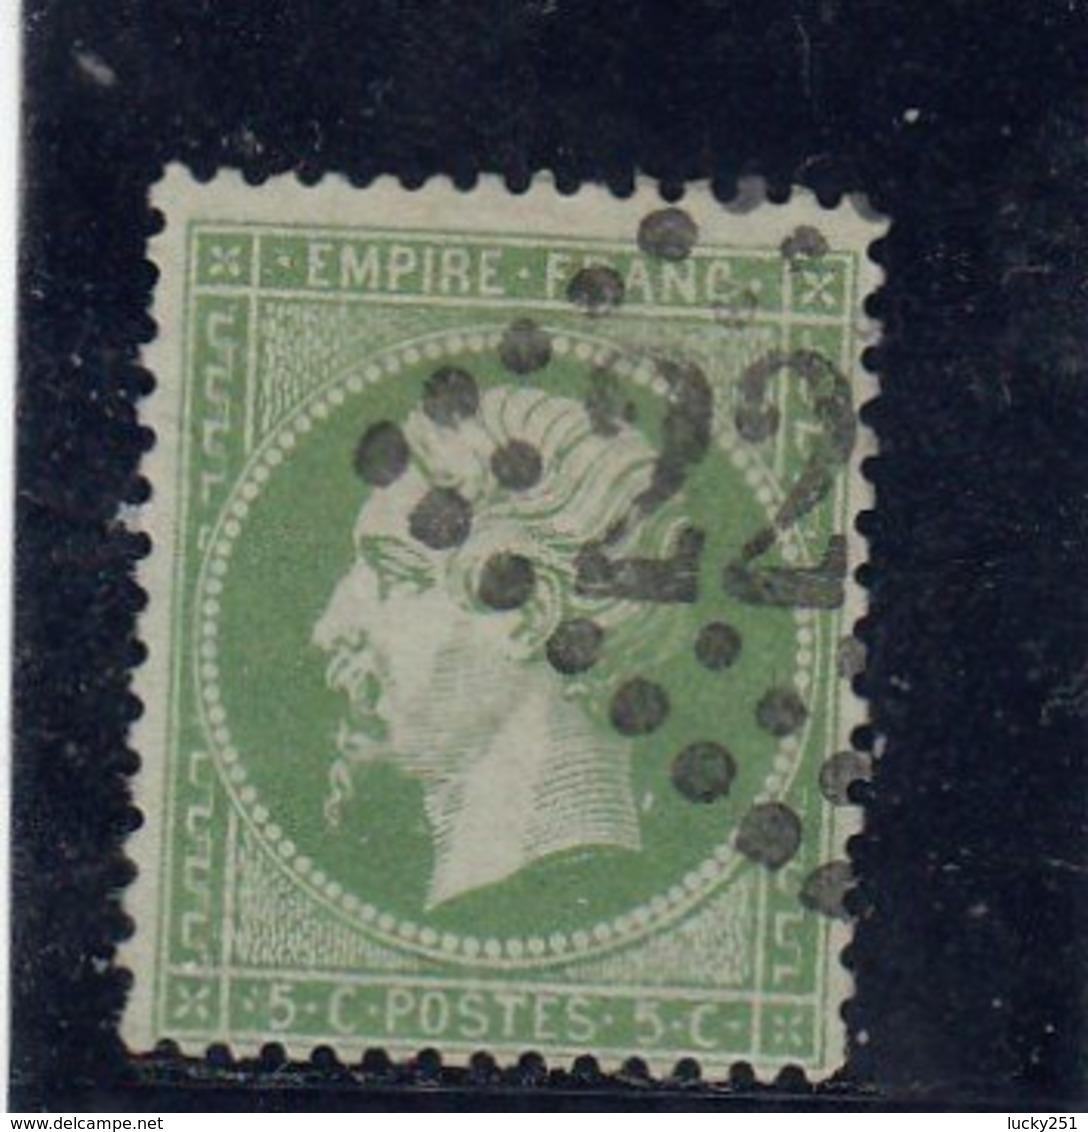 France - Napoléon III - N°Y.T 20 - 5c Vert - Oblit. Losange GC - 1862 Napoleone III